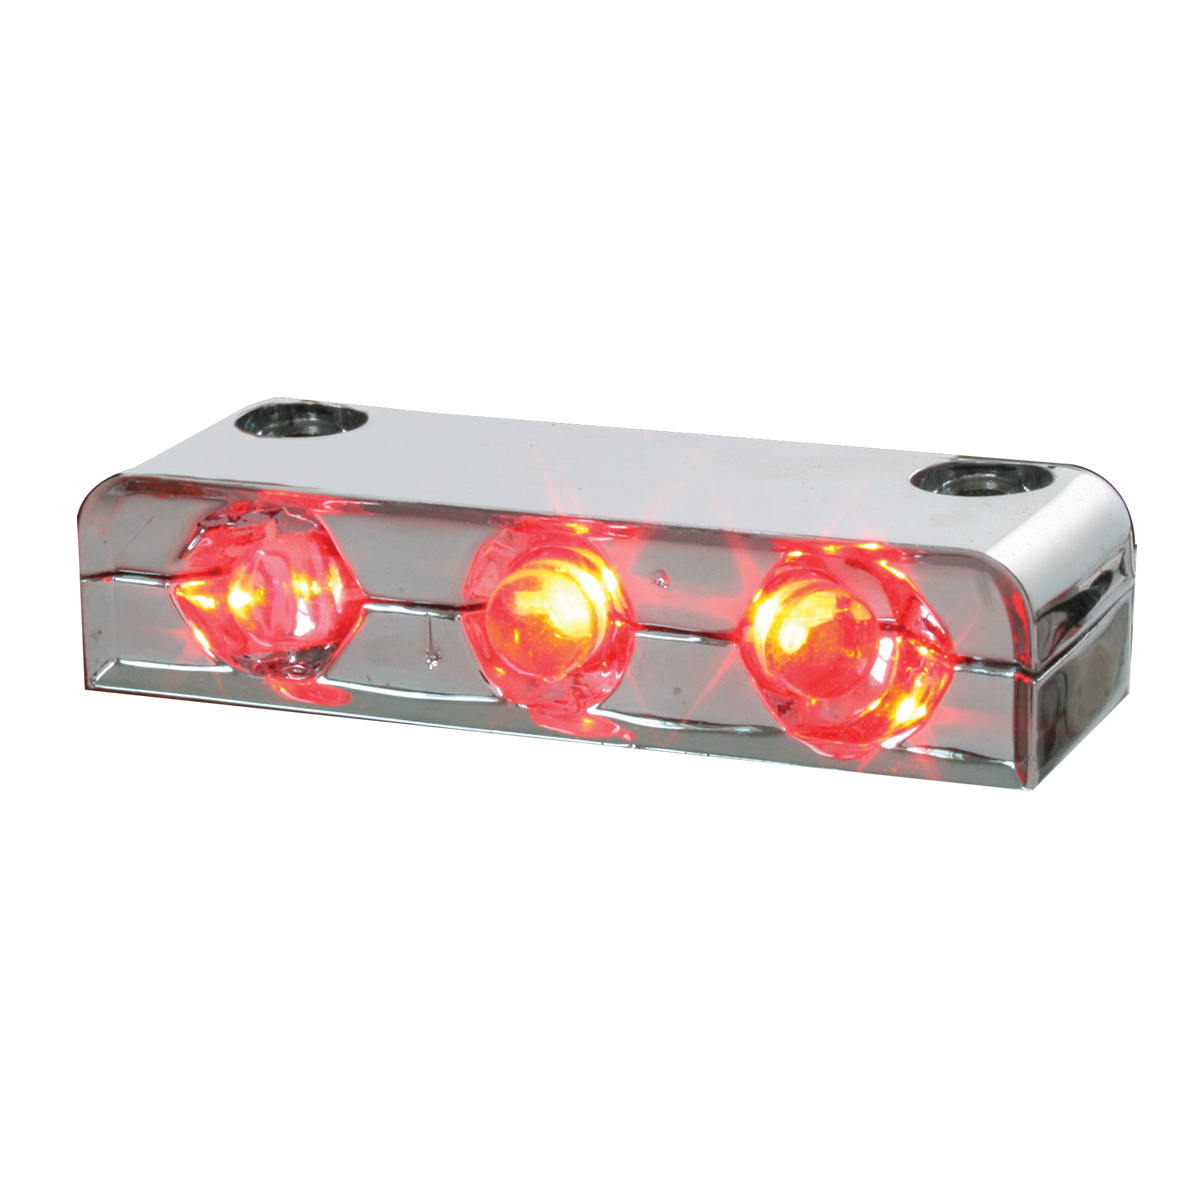 87403 Red 3 LED Step Light w/ Chrome Housing